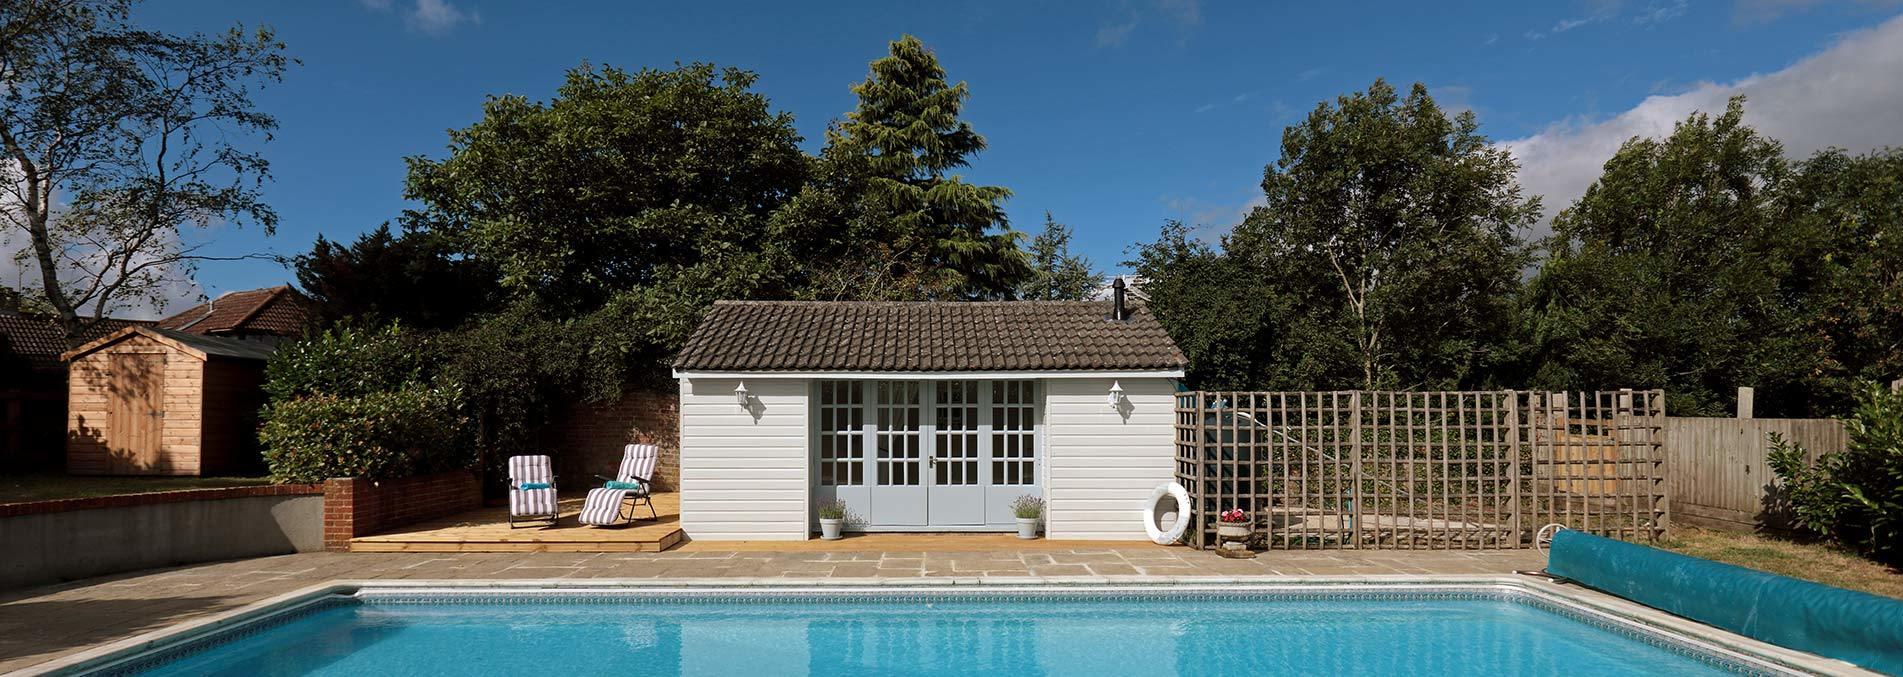 Property Photographer Dorset